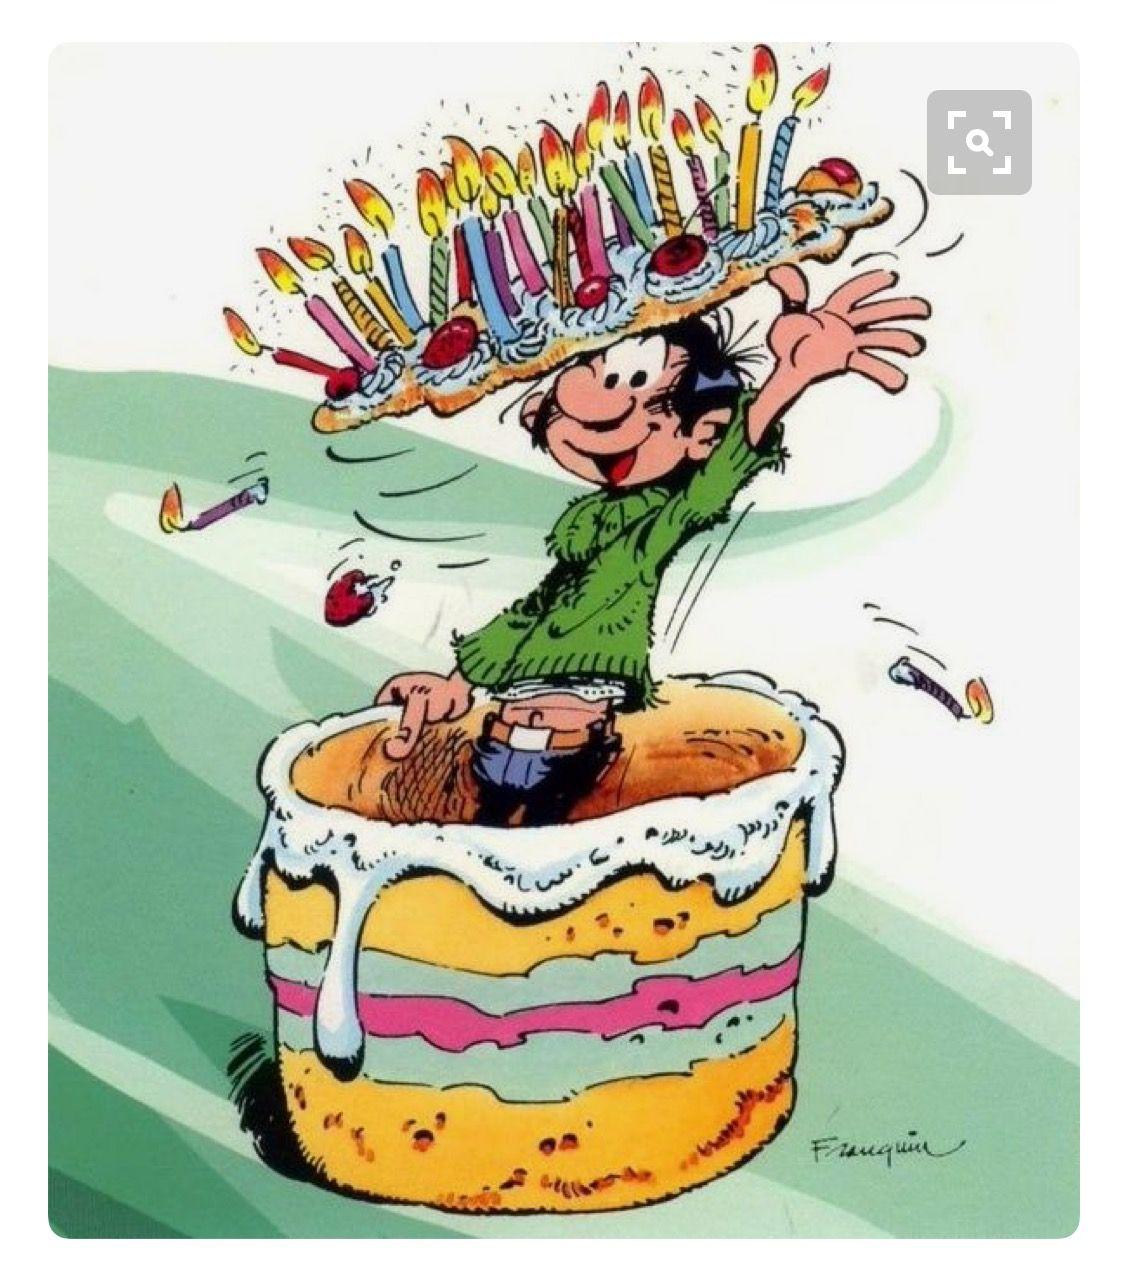 Gratuit Dessin Humoristique Gateau Anniversaire | HumourLa